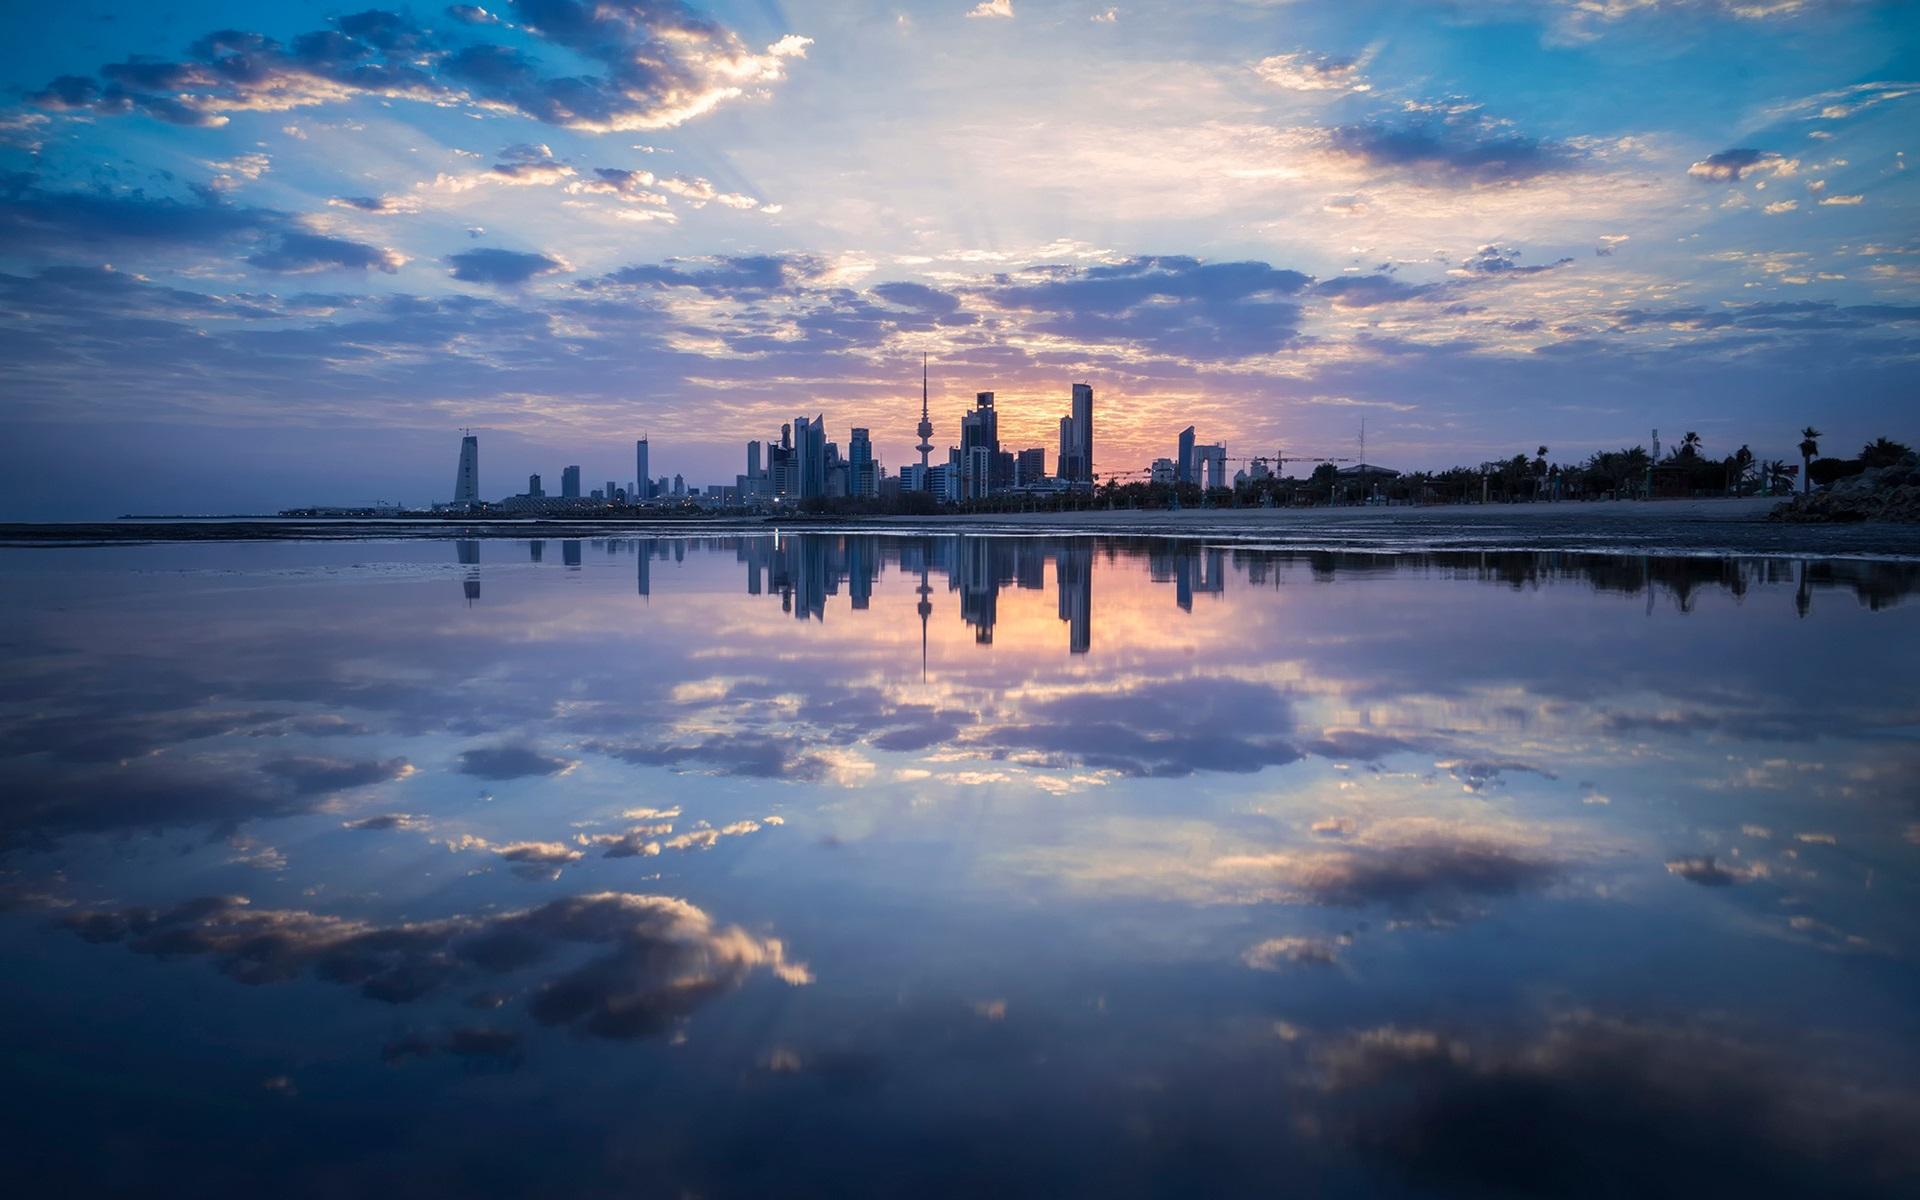 Wallpaper Dusk Kuwait City buildings sea clouds 1920x1200 HD 1920x1200